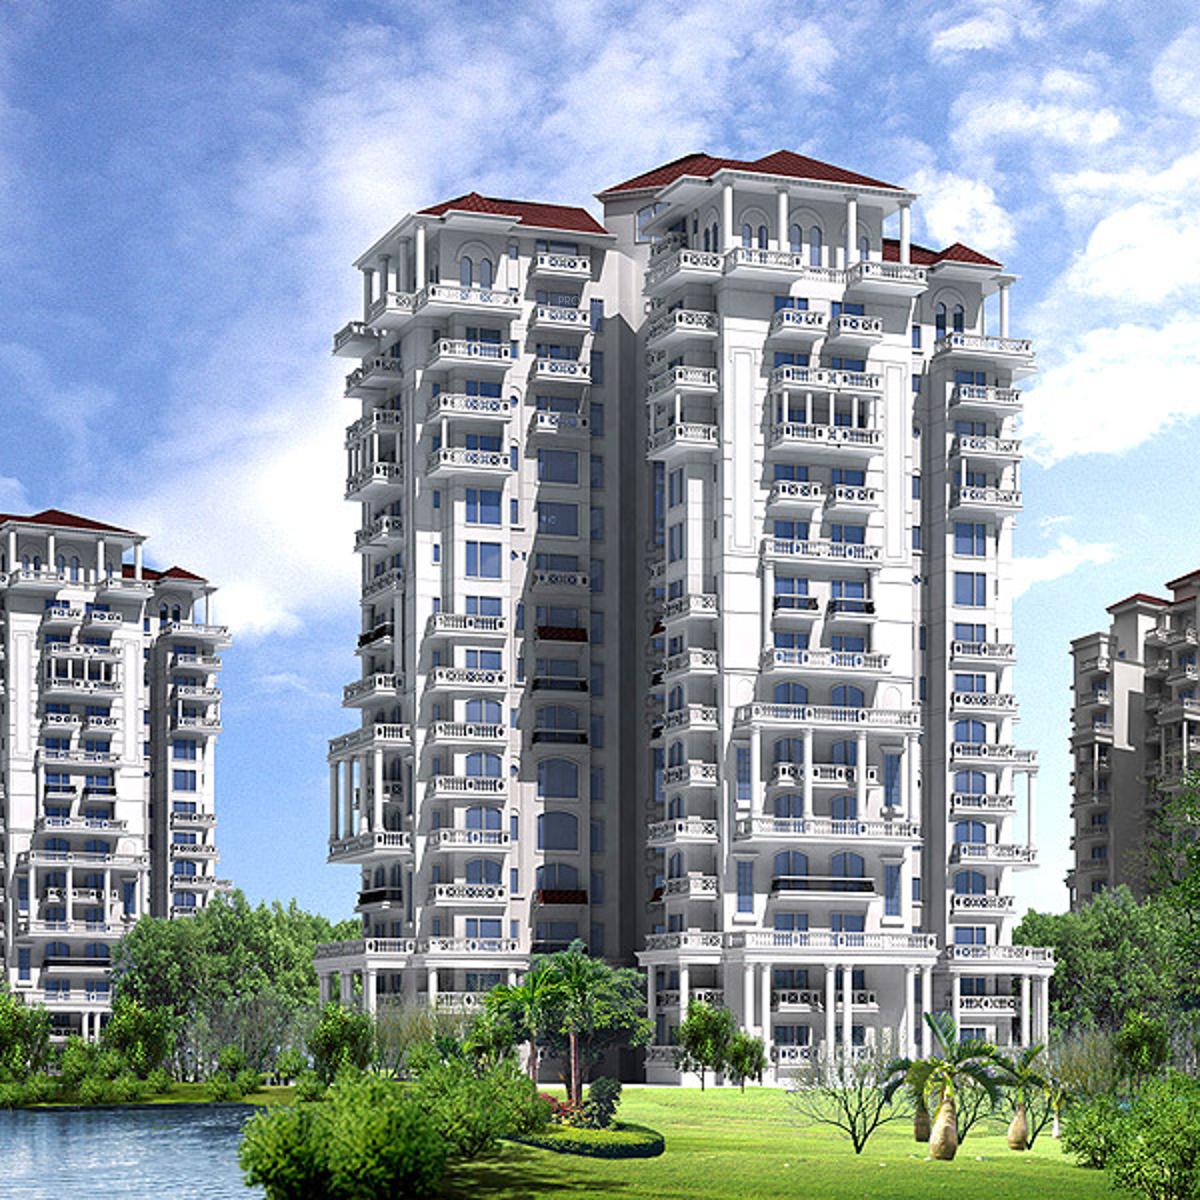 Tivoli Apartments: Tivoli Holiday Village In Sector 5 Dharuhera, Gurgaon